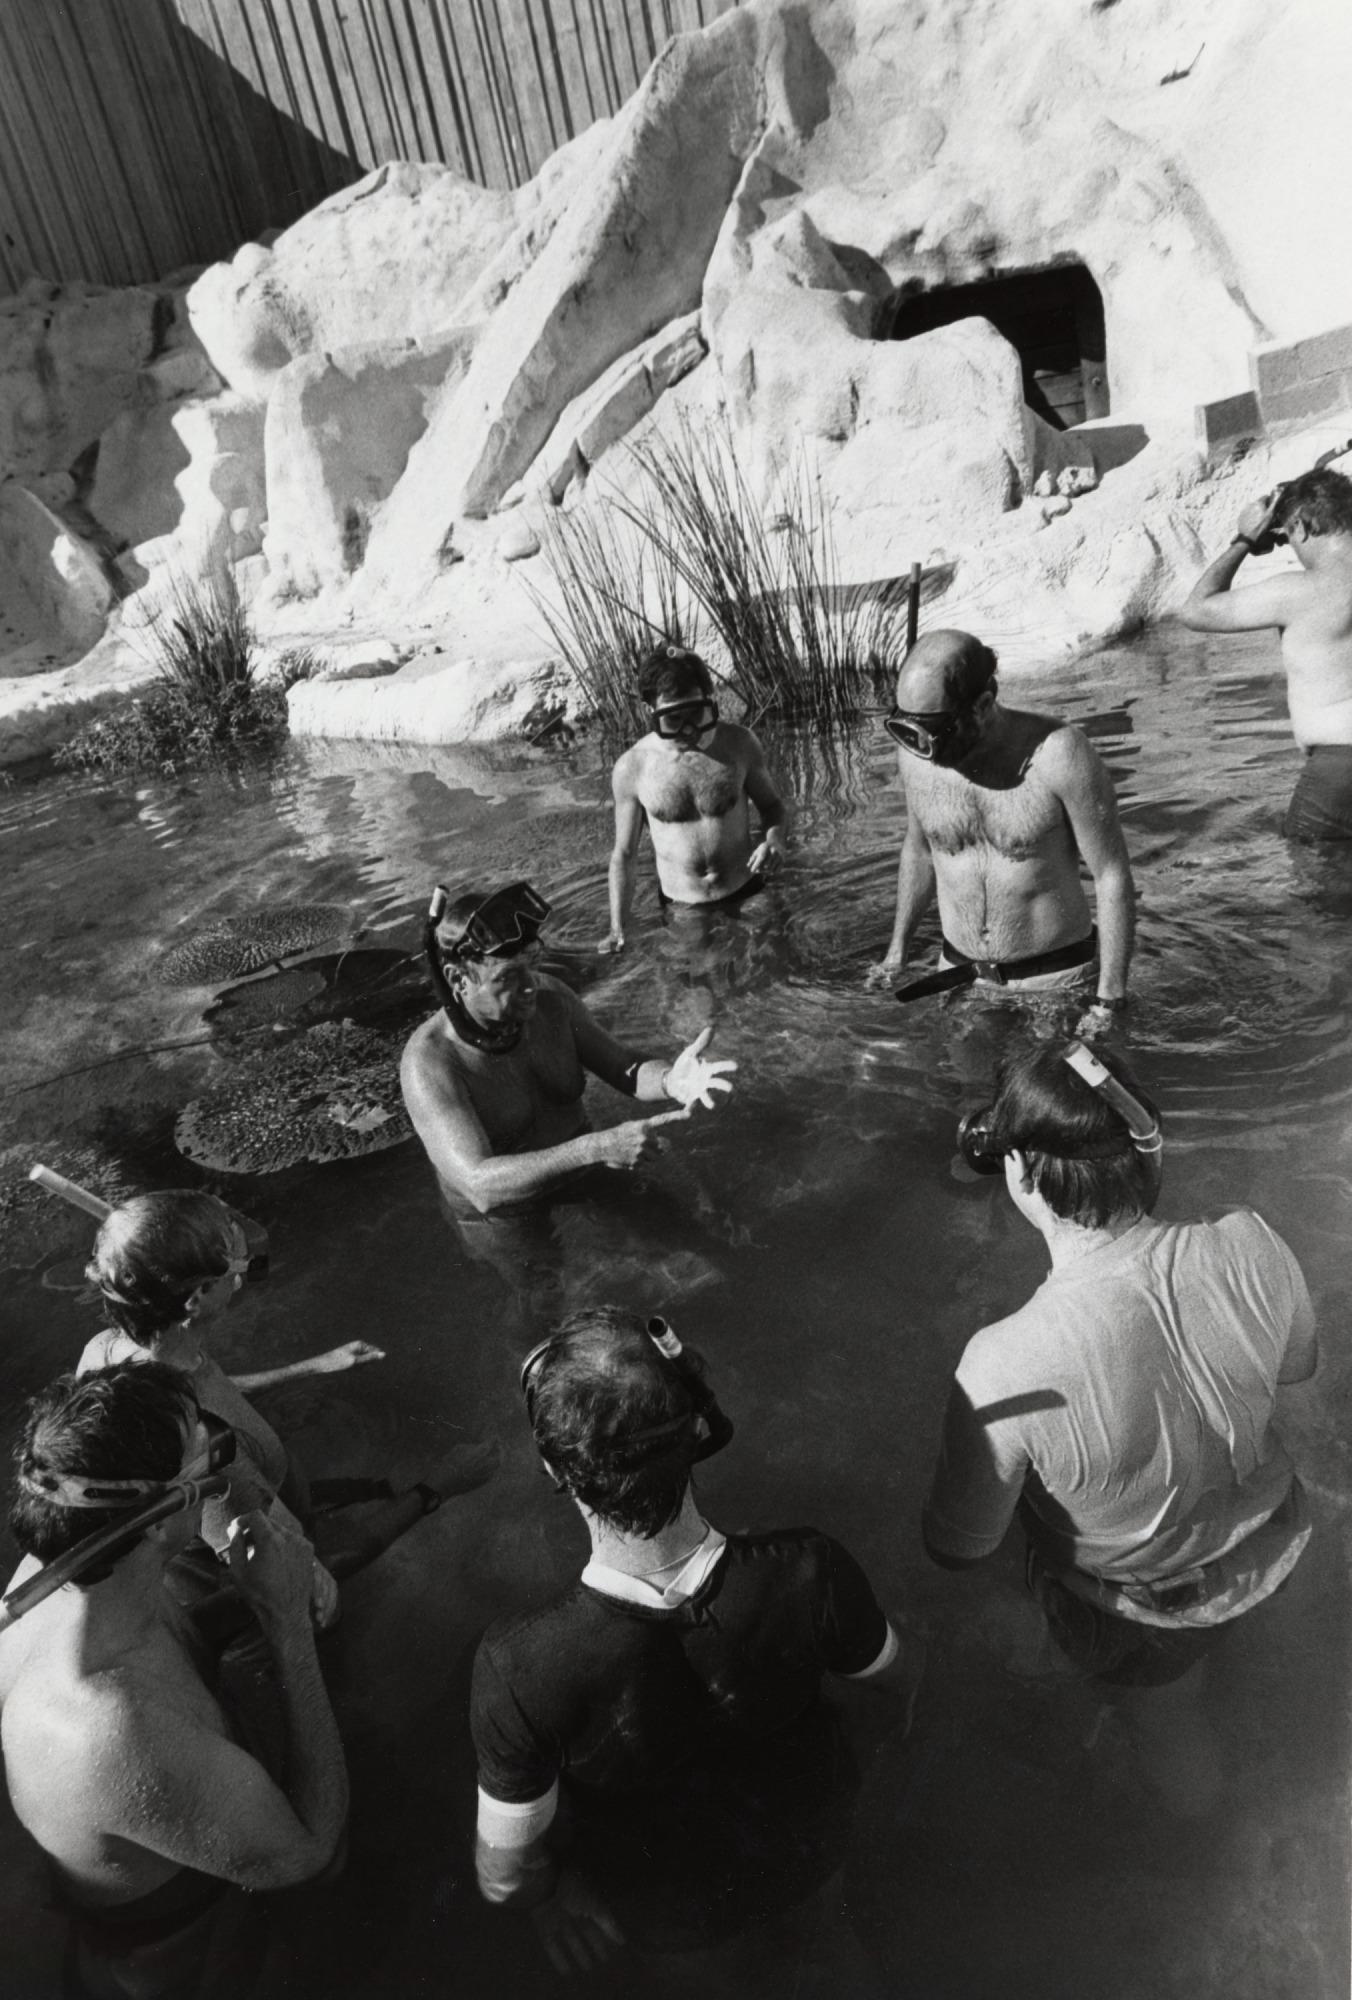 NZP Diving Class in Old Polar Bear Pool